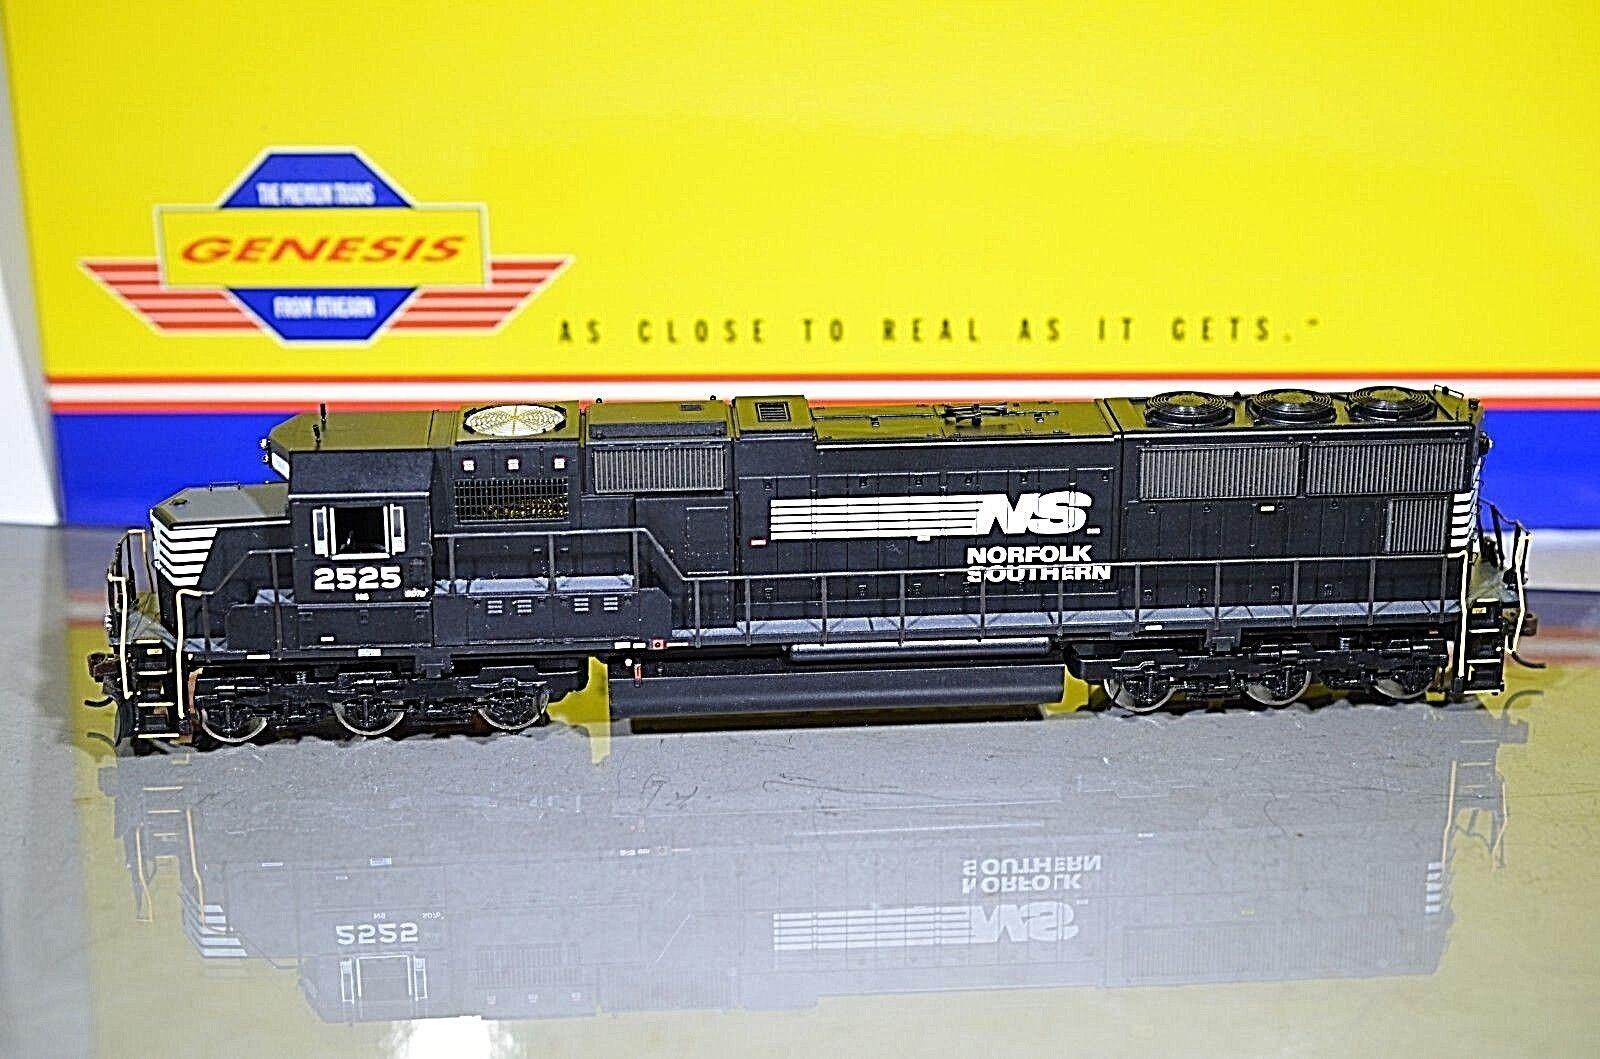 ATHEARN GENESIS NS Norfolk Southern SD70  2525 HO Diesel Locomotive G6115 NEW